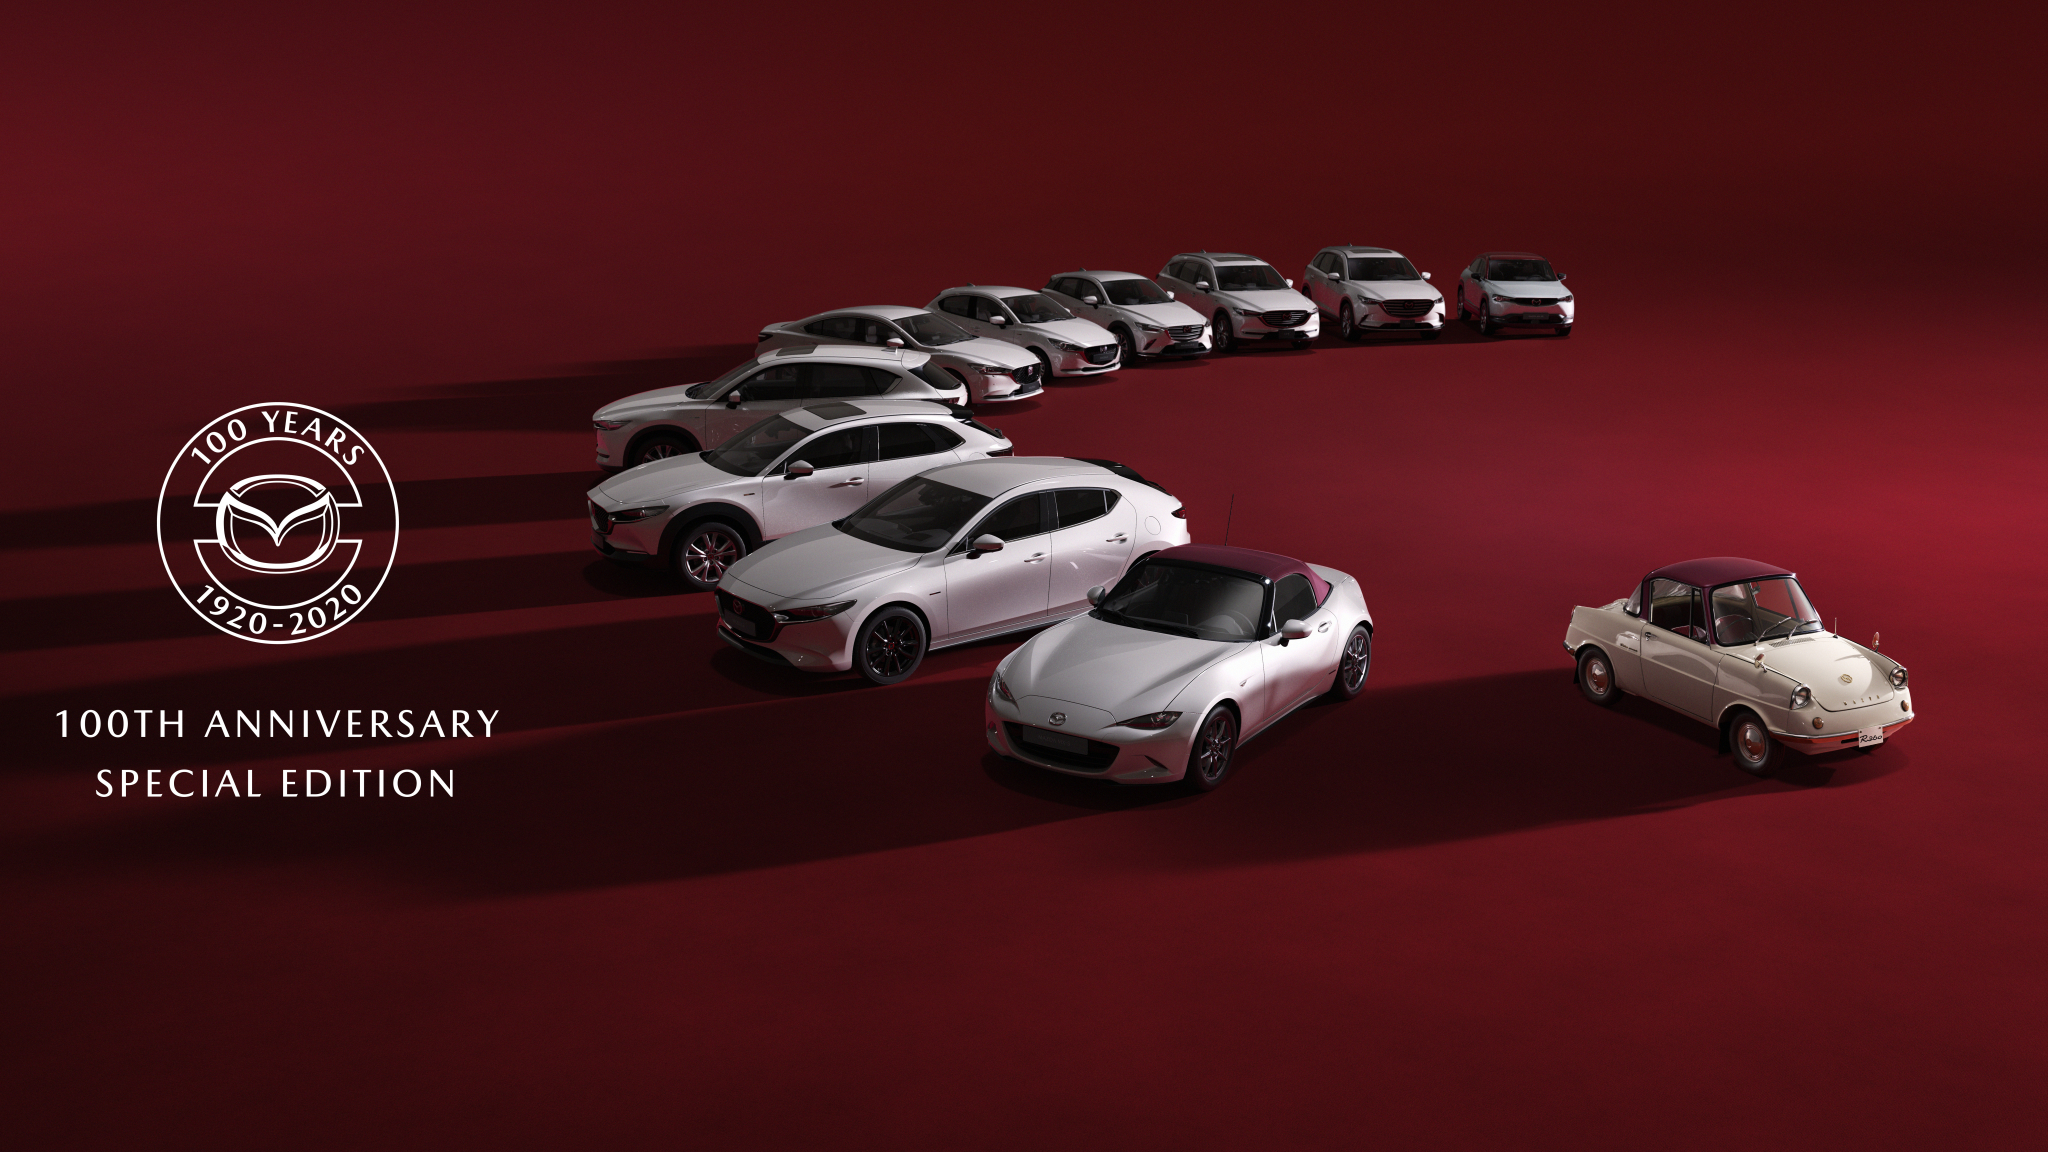 Mazda's 100th Anniversary Special Edition Series